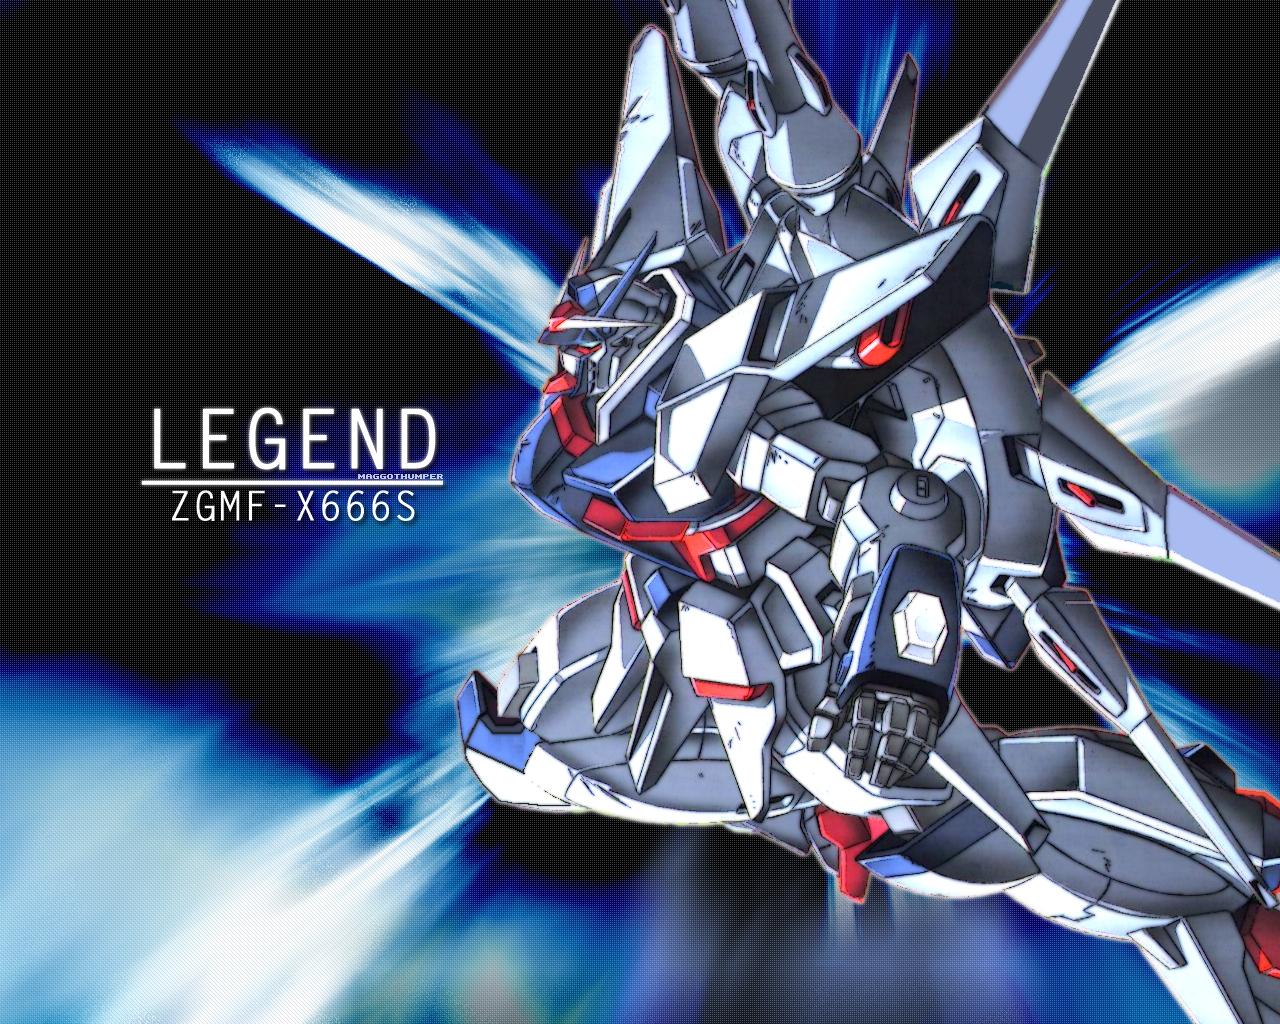 Gundam Seed Destiny images GSD wallpaper photos 24471478 1280x1024